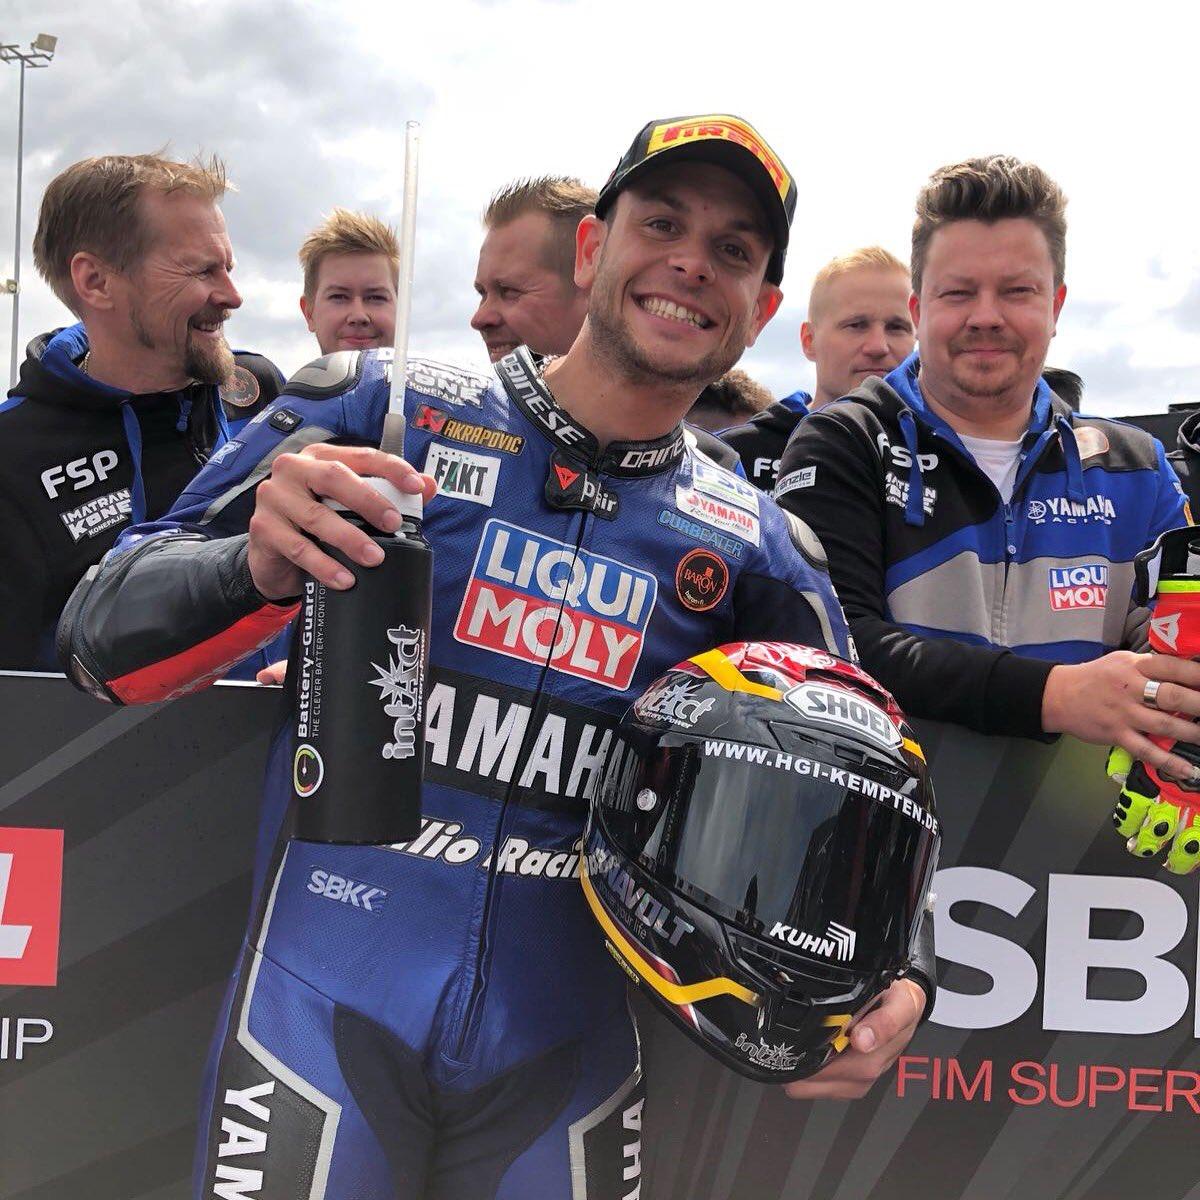 Sandro Cortese gana en terrenos conocido. Yamaha apabulla a sus rivales.